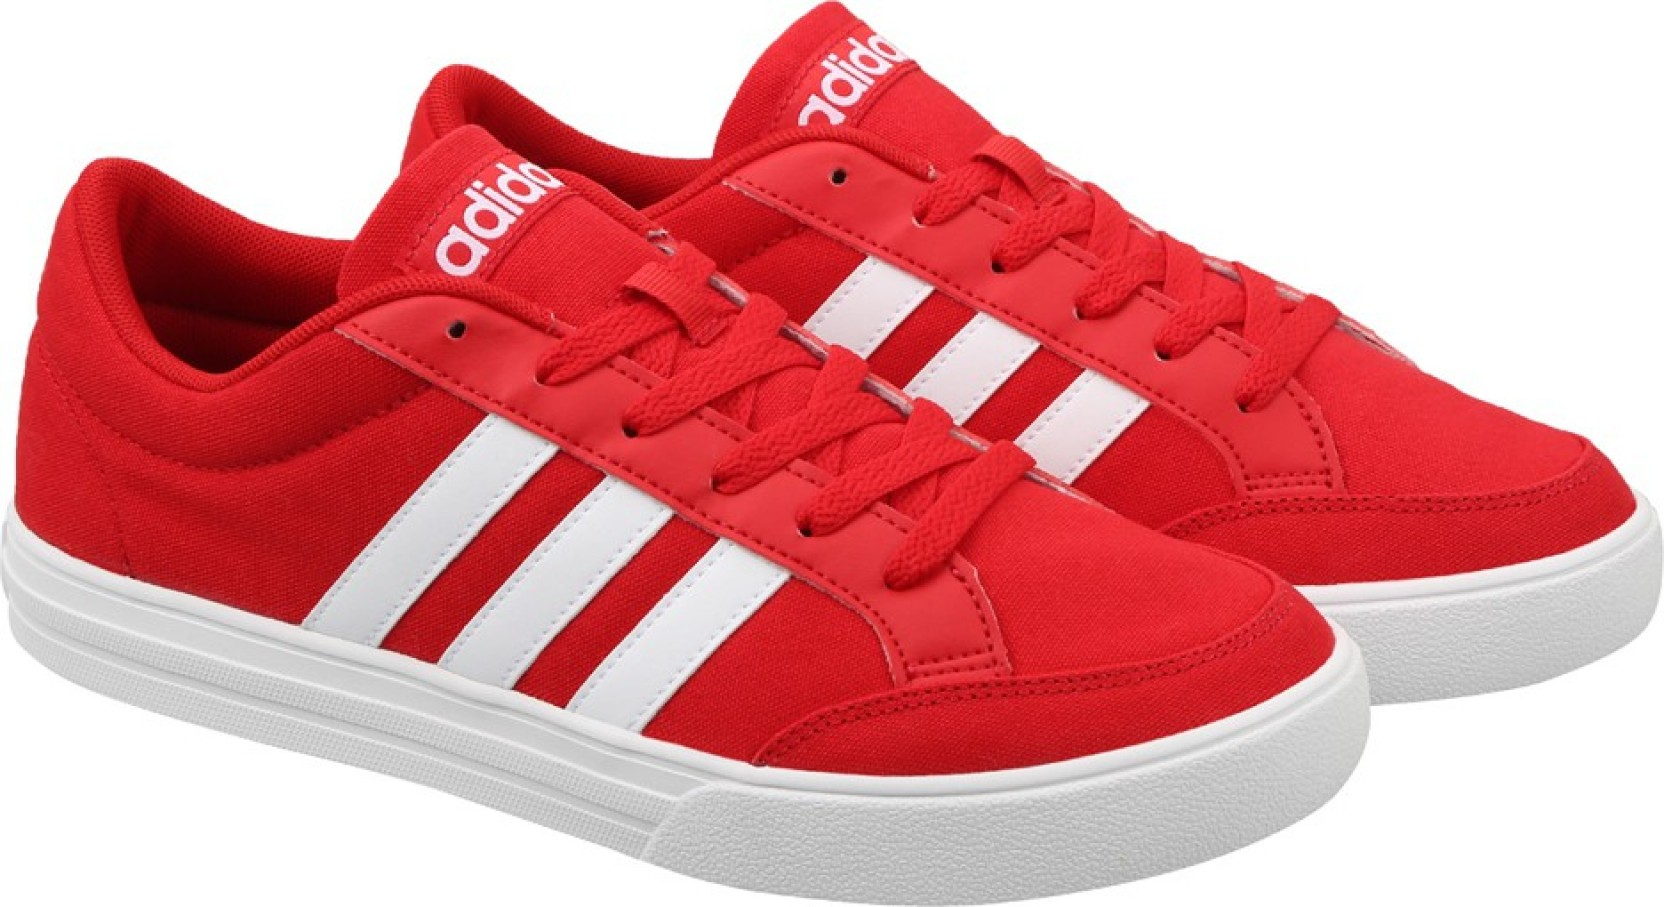 Adidas Sneakers Shoes Flipkart